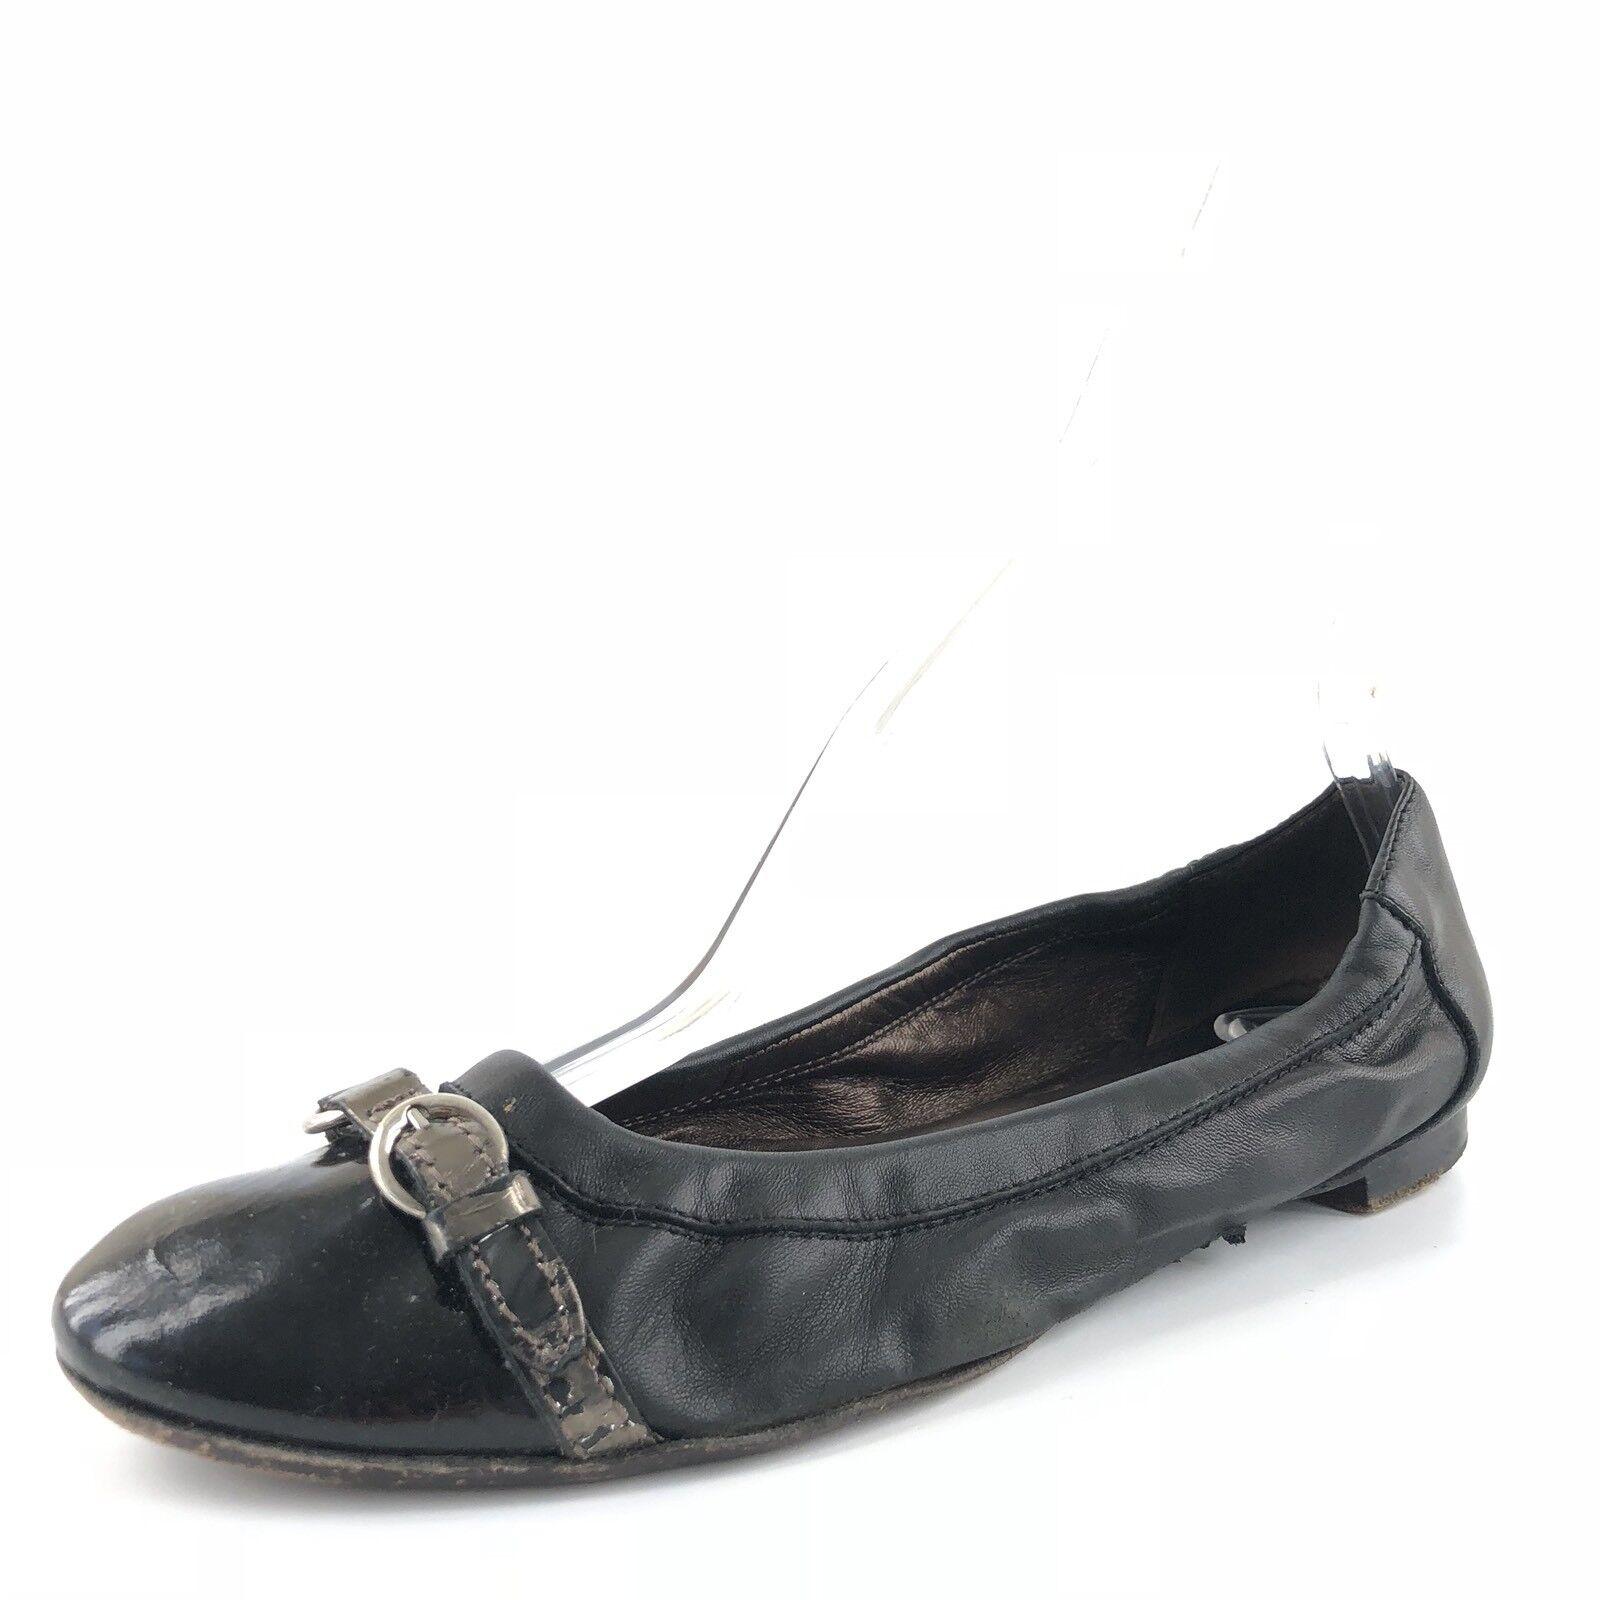 AGL Attilio Giusti Leombruni Womens Black Leather Toe Cap Ballet Flats Size 39 M